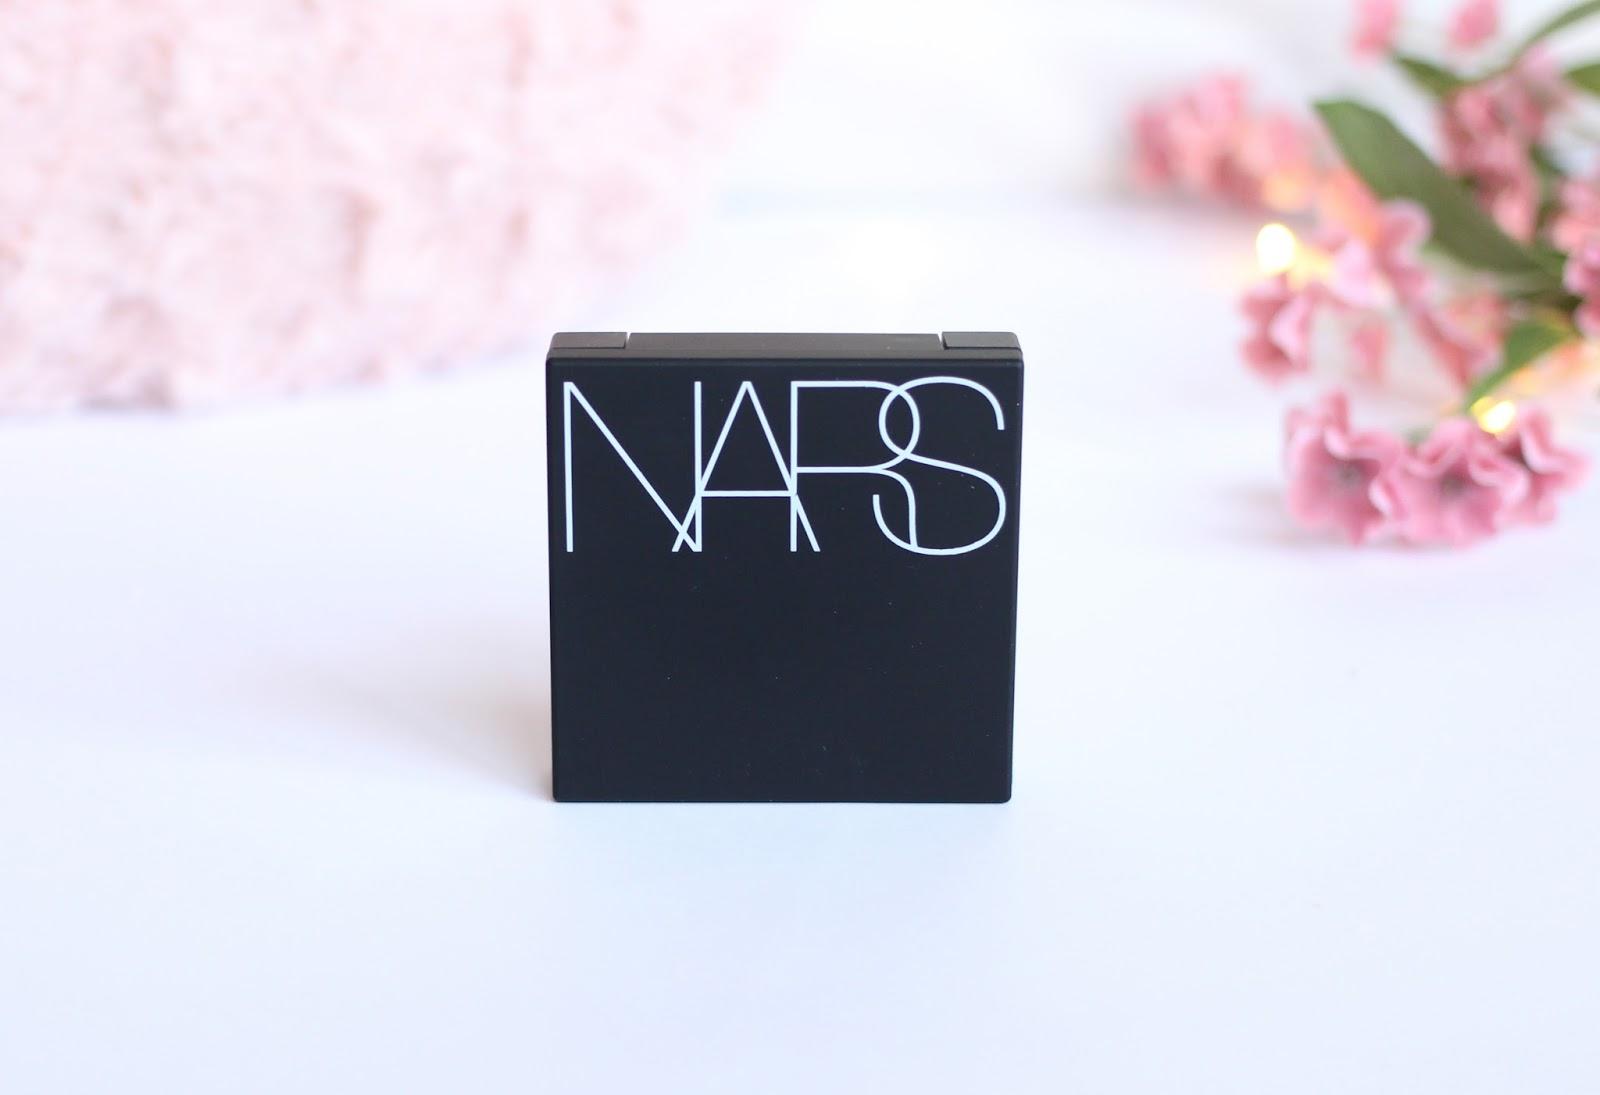 NARS Dual Intensity Blush in 'Fervor'